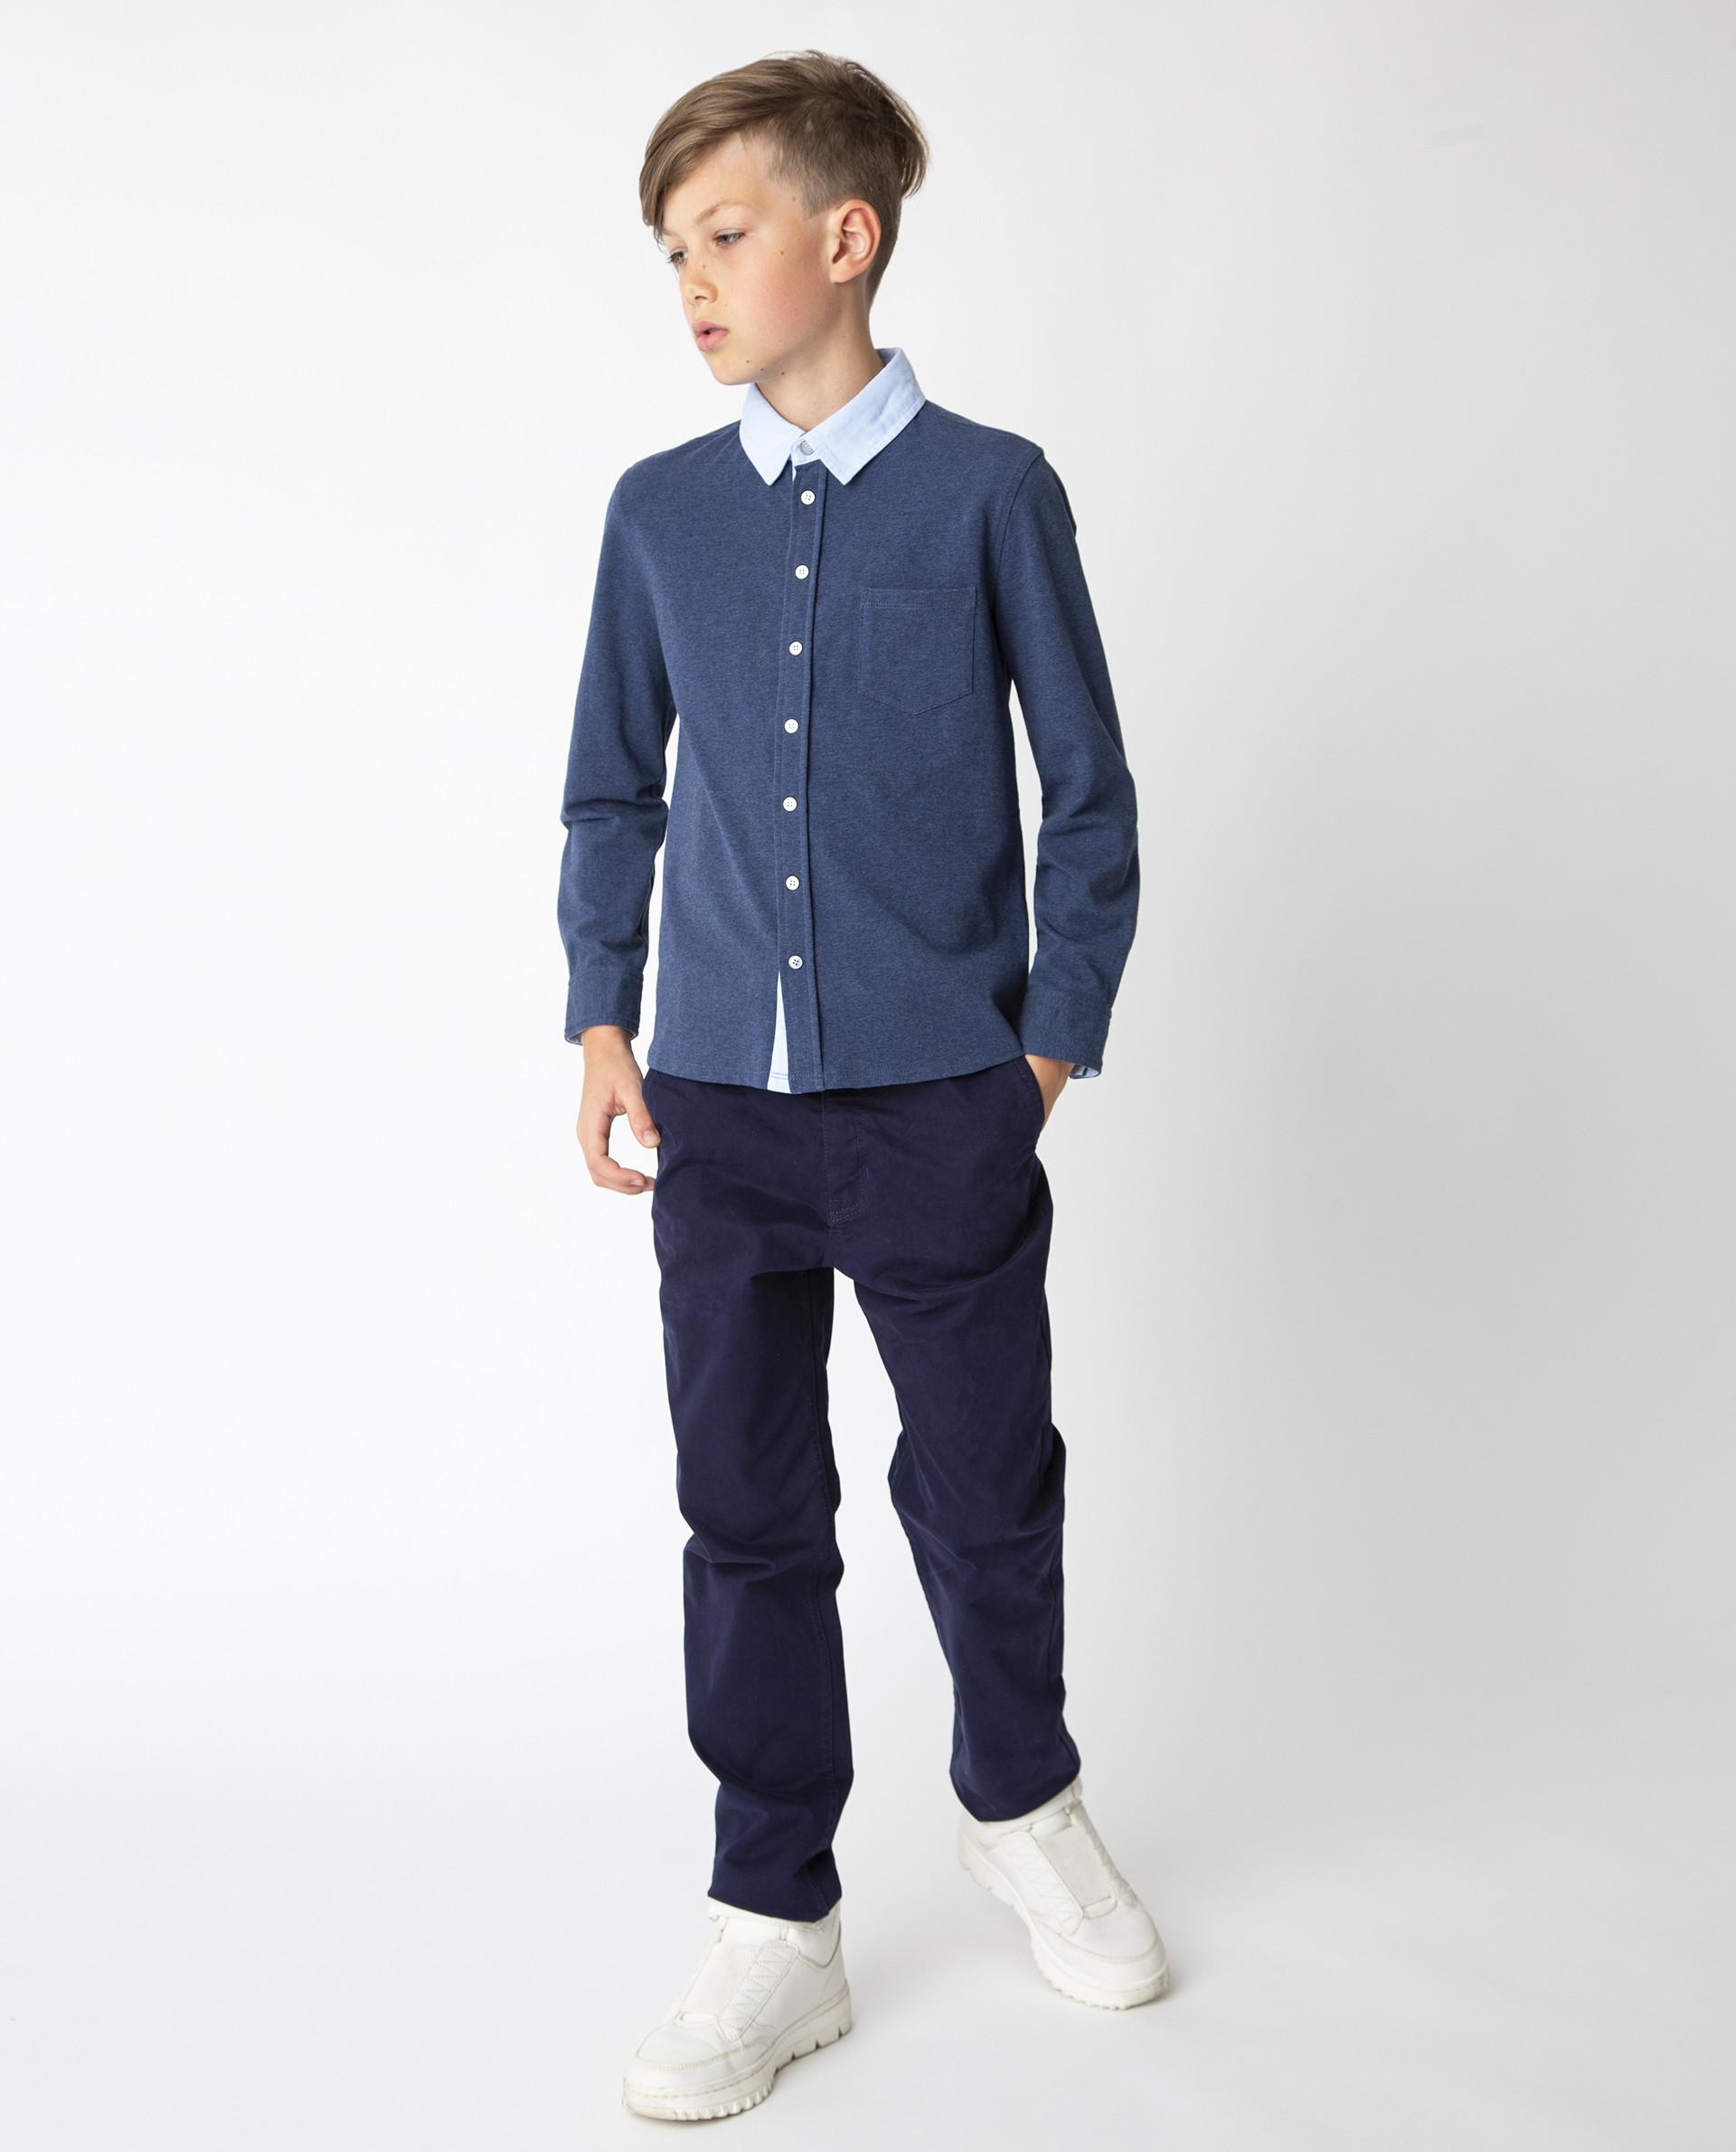 Синяя рубашка на кнопках Gulliver, модель 220GSBC1409, р. 122